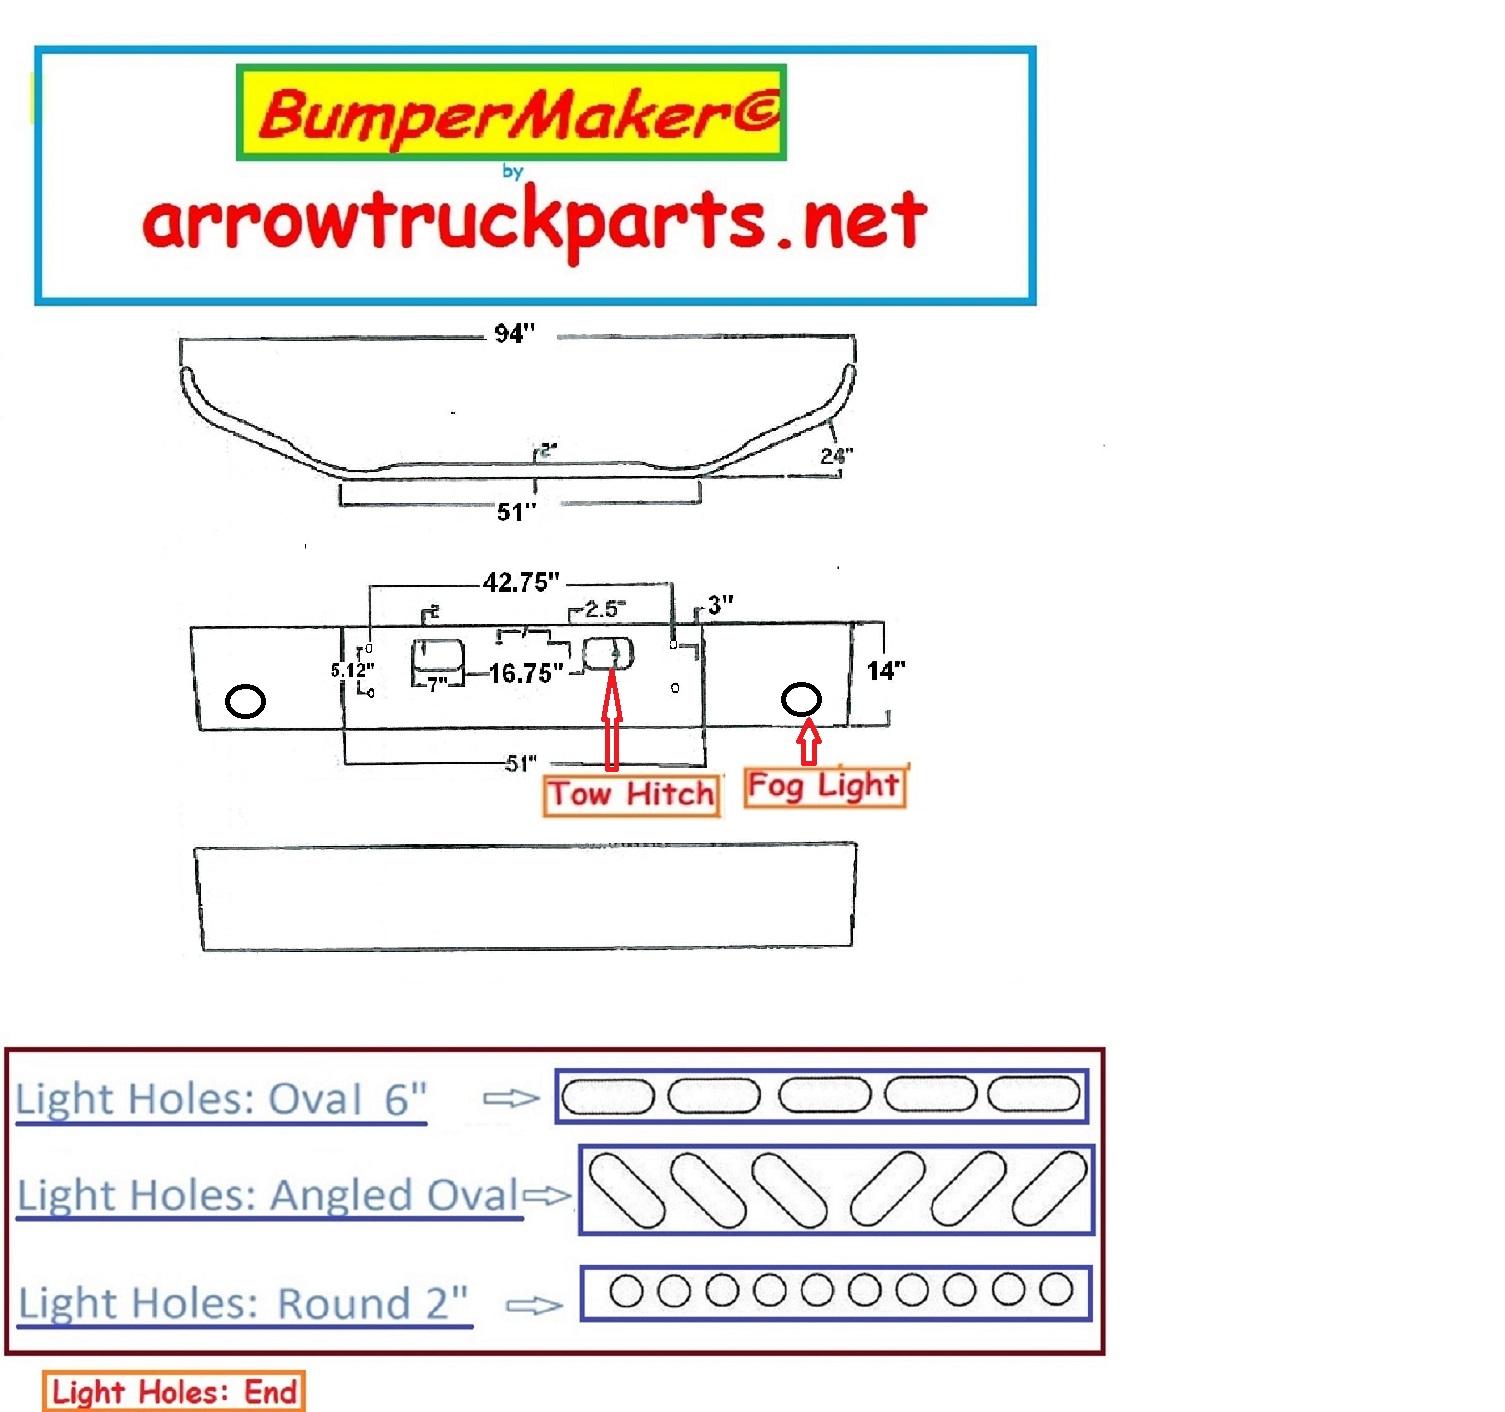 BumperMaker: GMC - Chevrolet C4500 & C5500 Bumper: 2004 TO 2008 -  on